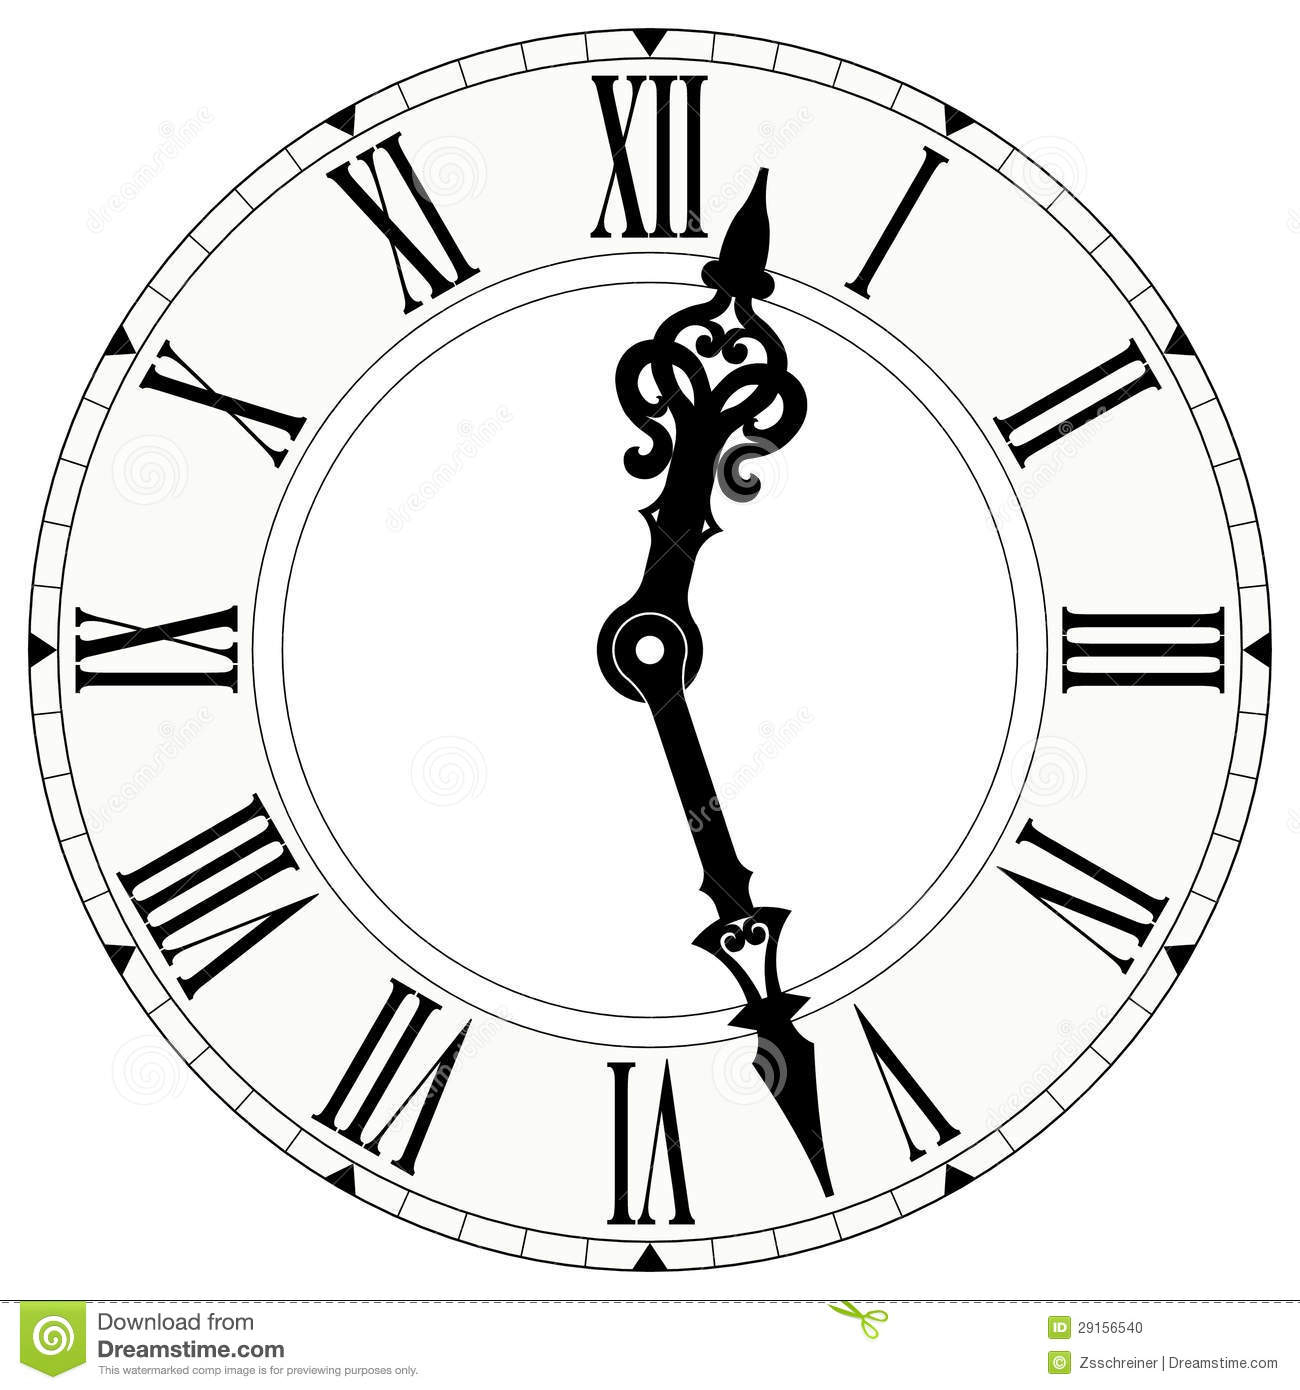 Horloge De Chiffre Romain Illustration Stock. Illustration concernant Dessin Chiffre Romain